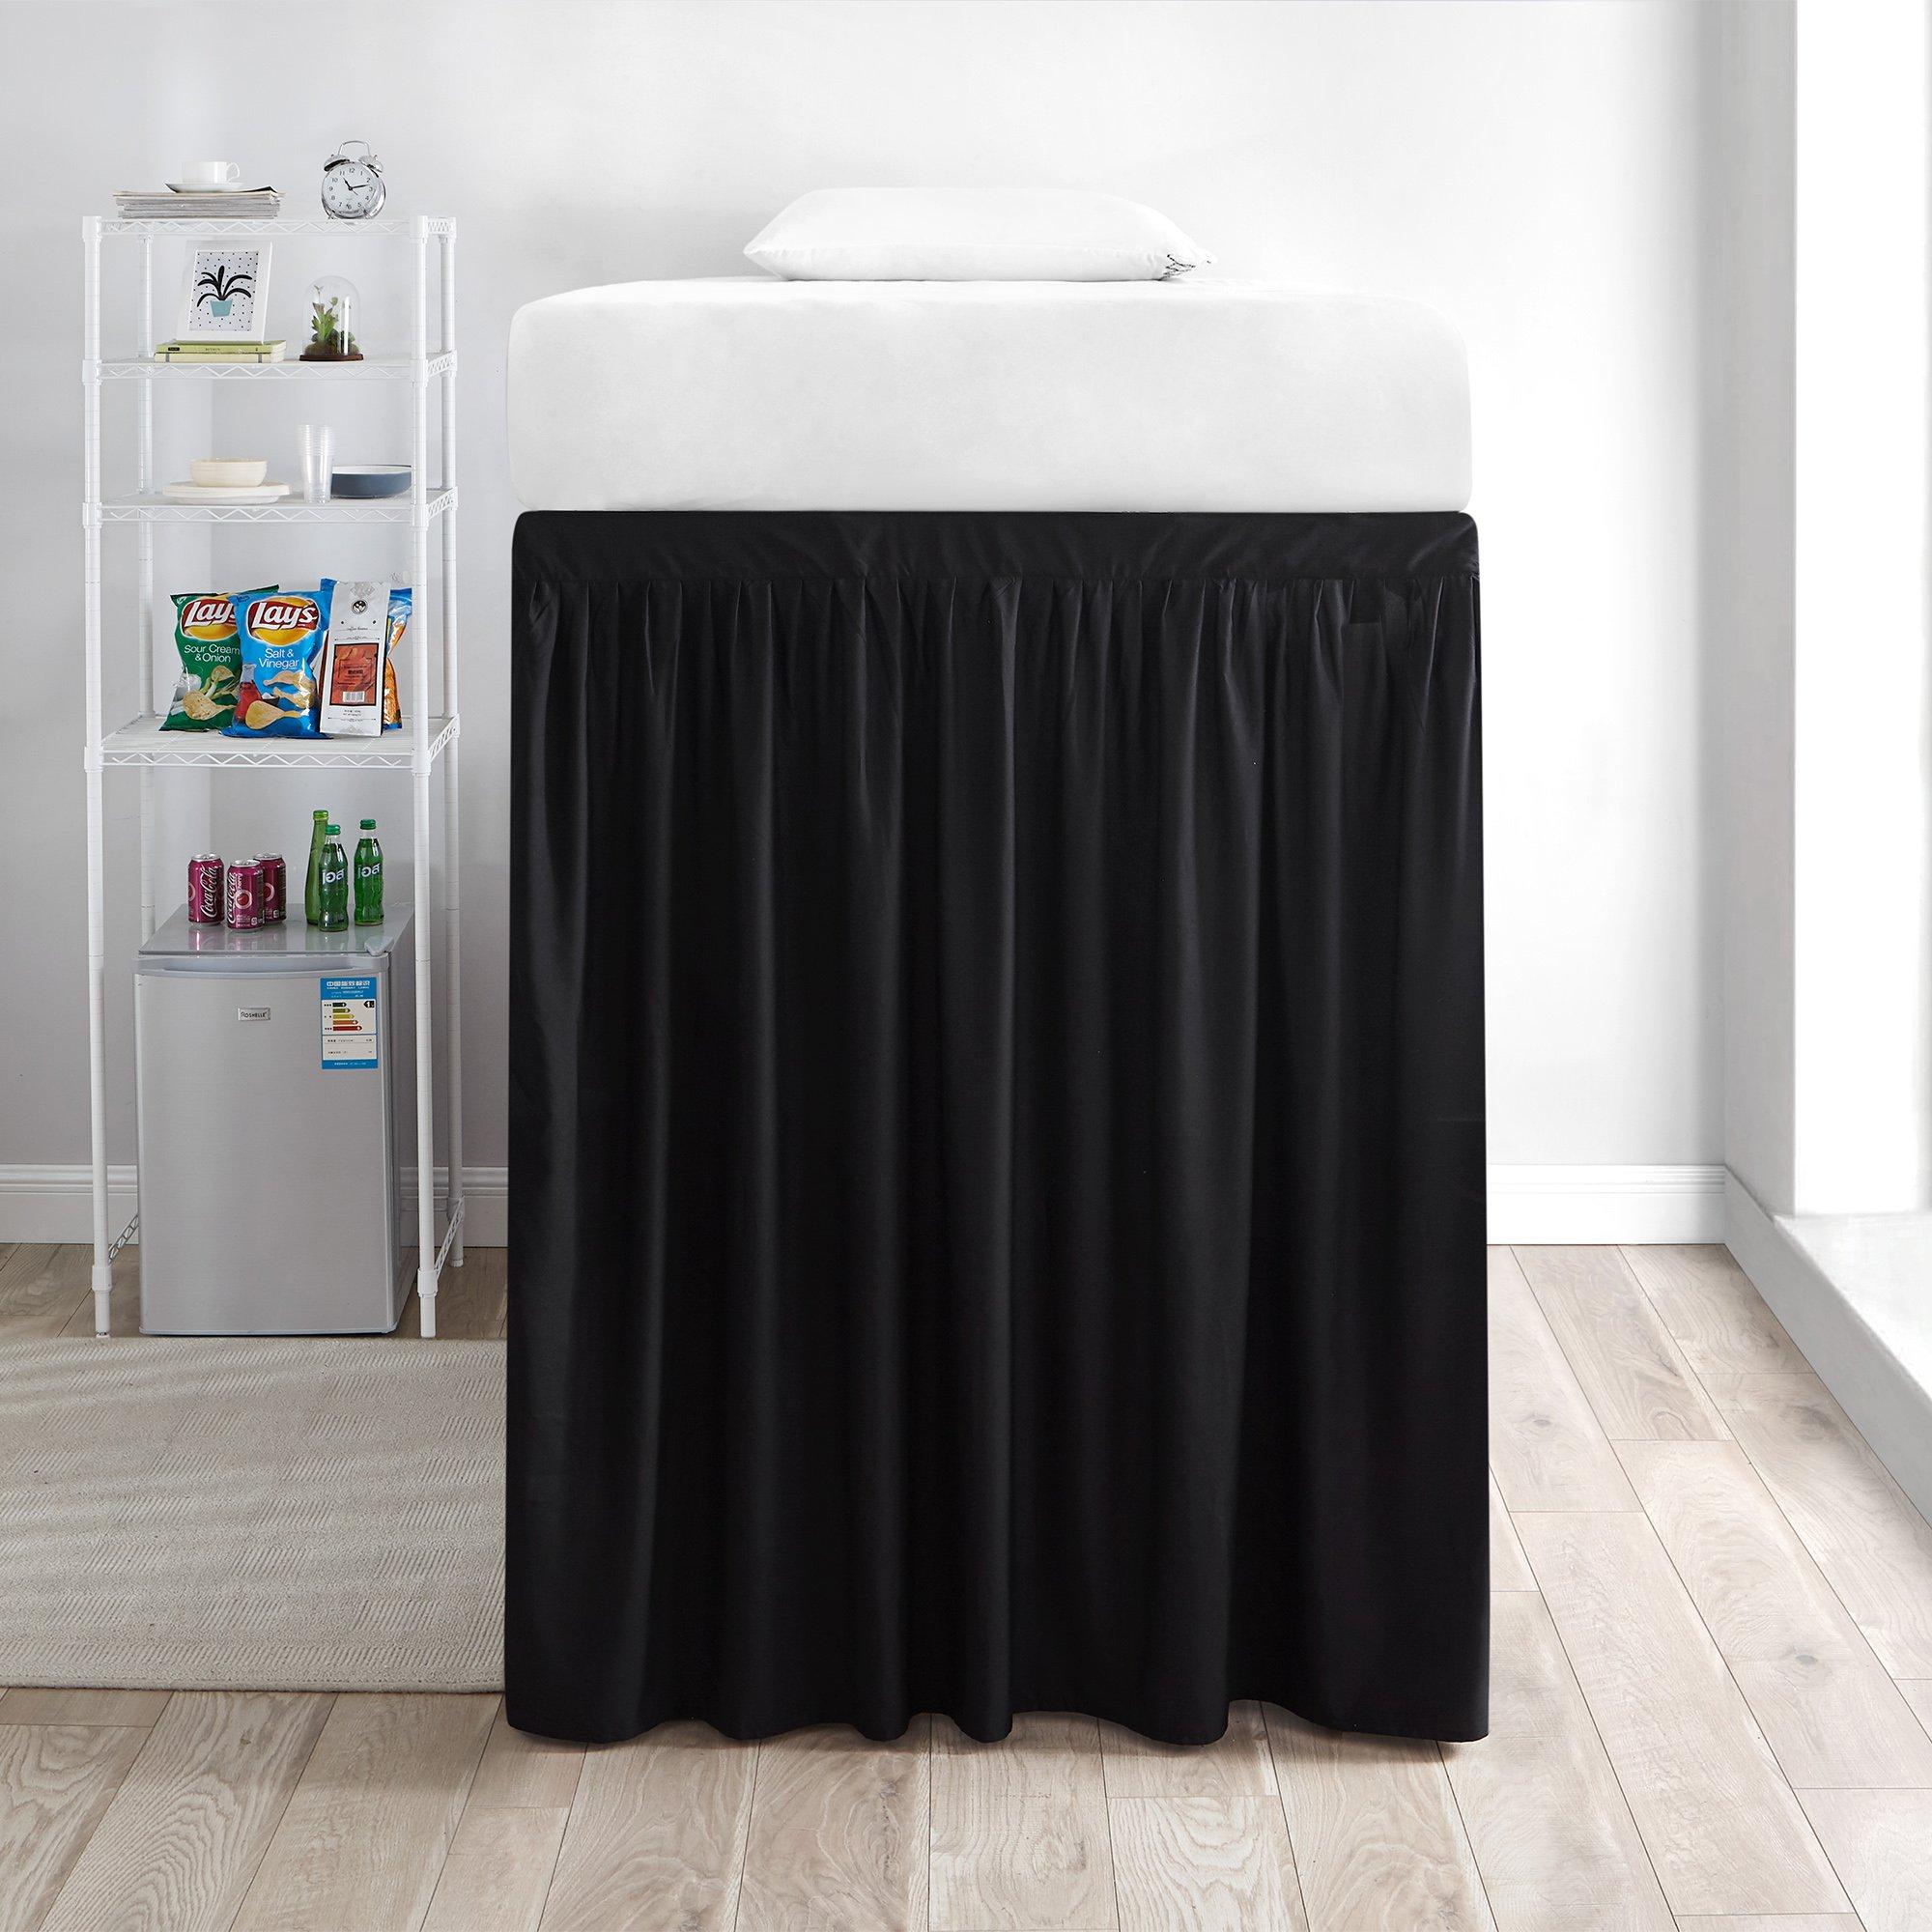 DormCo Extended Bed Skirt Twin XL (3 Panel Set) - Black